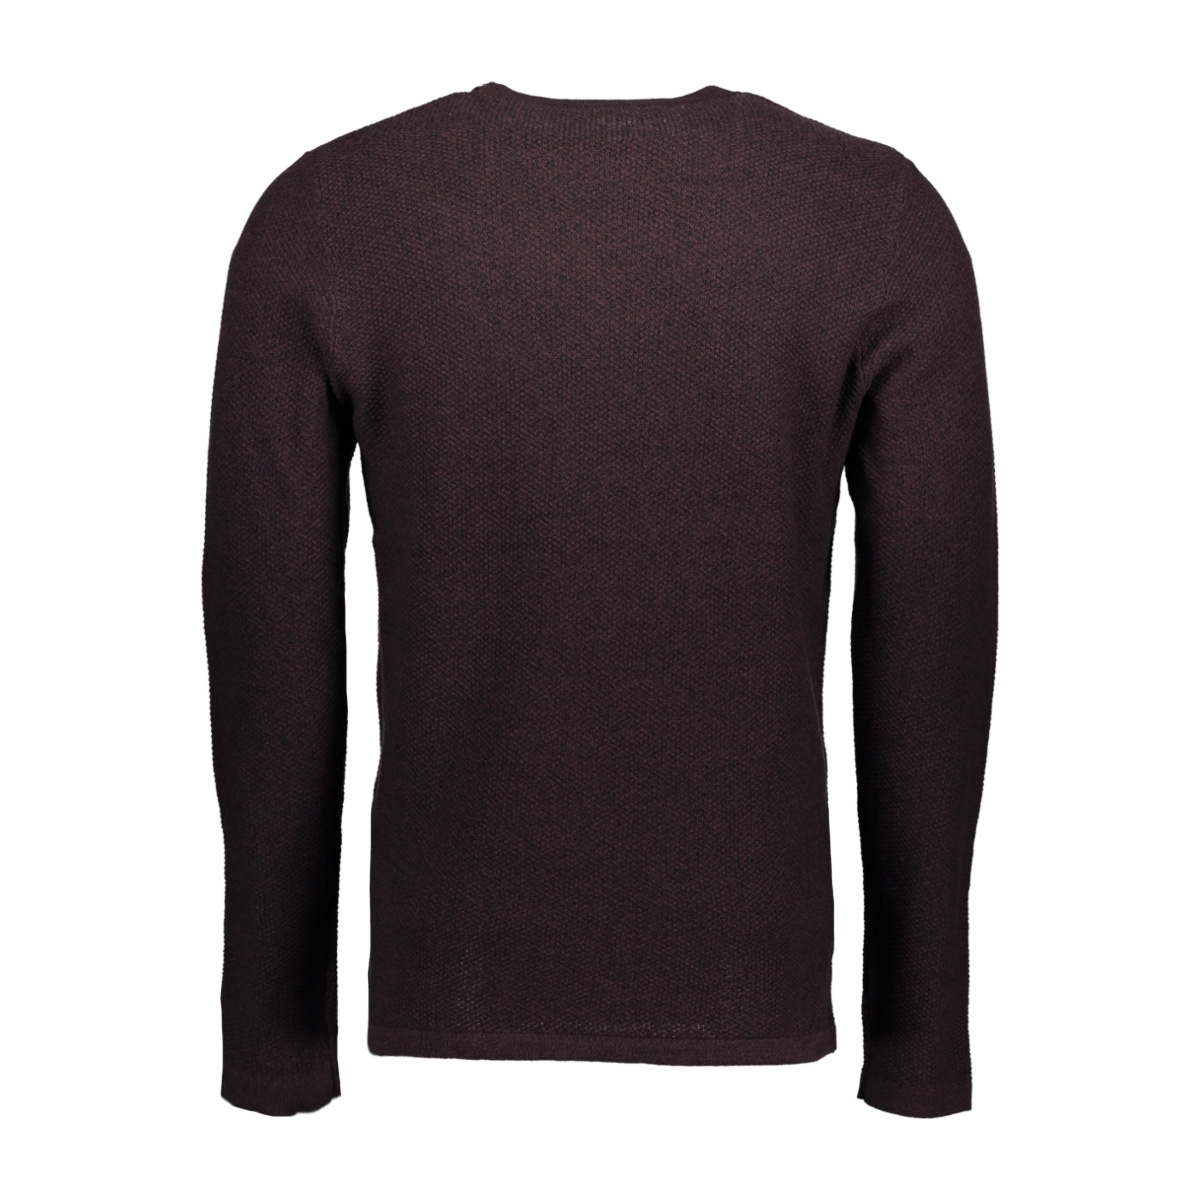 jprstory knit crew neck noos 12125929 jack & jones sweater fudge